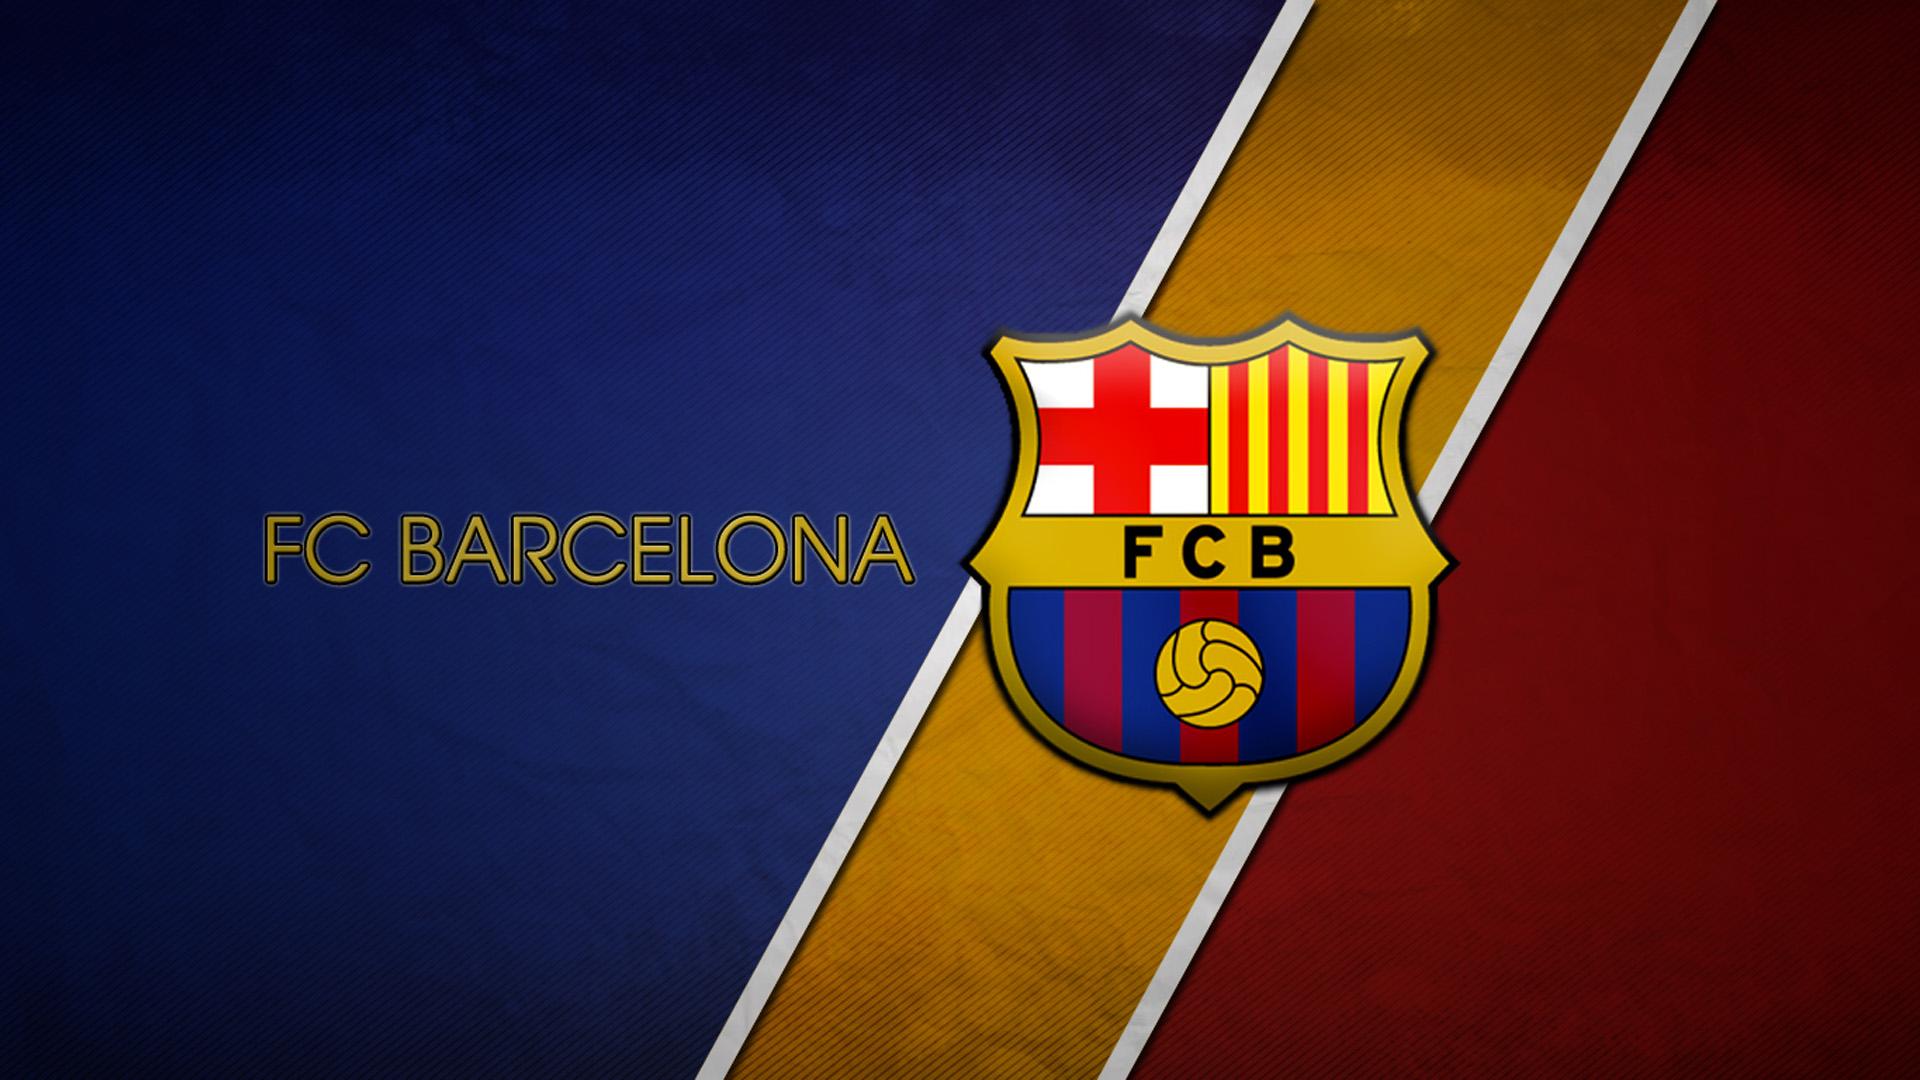 Fc barcelona logo